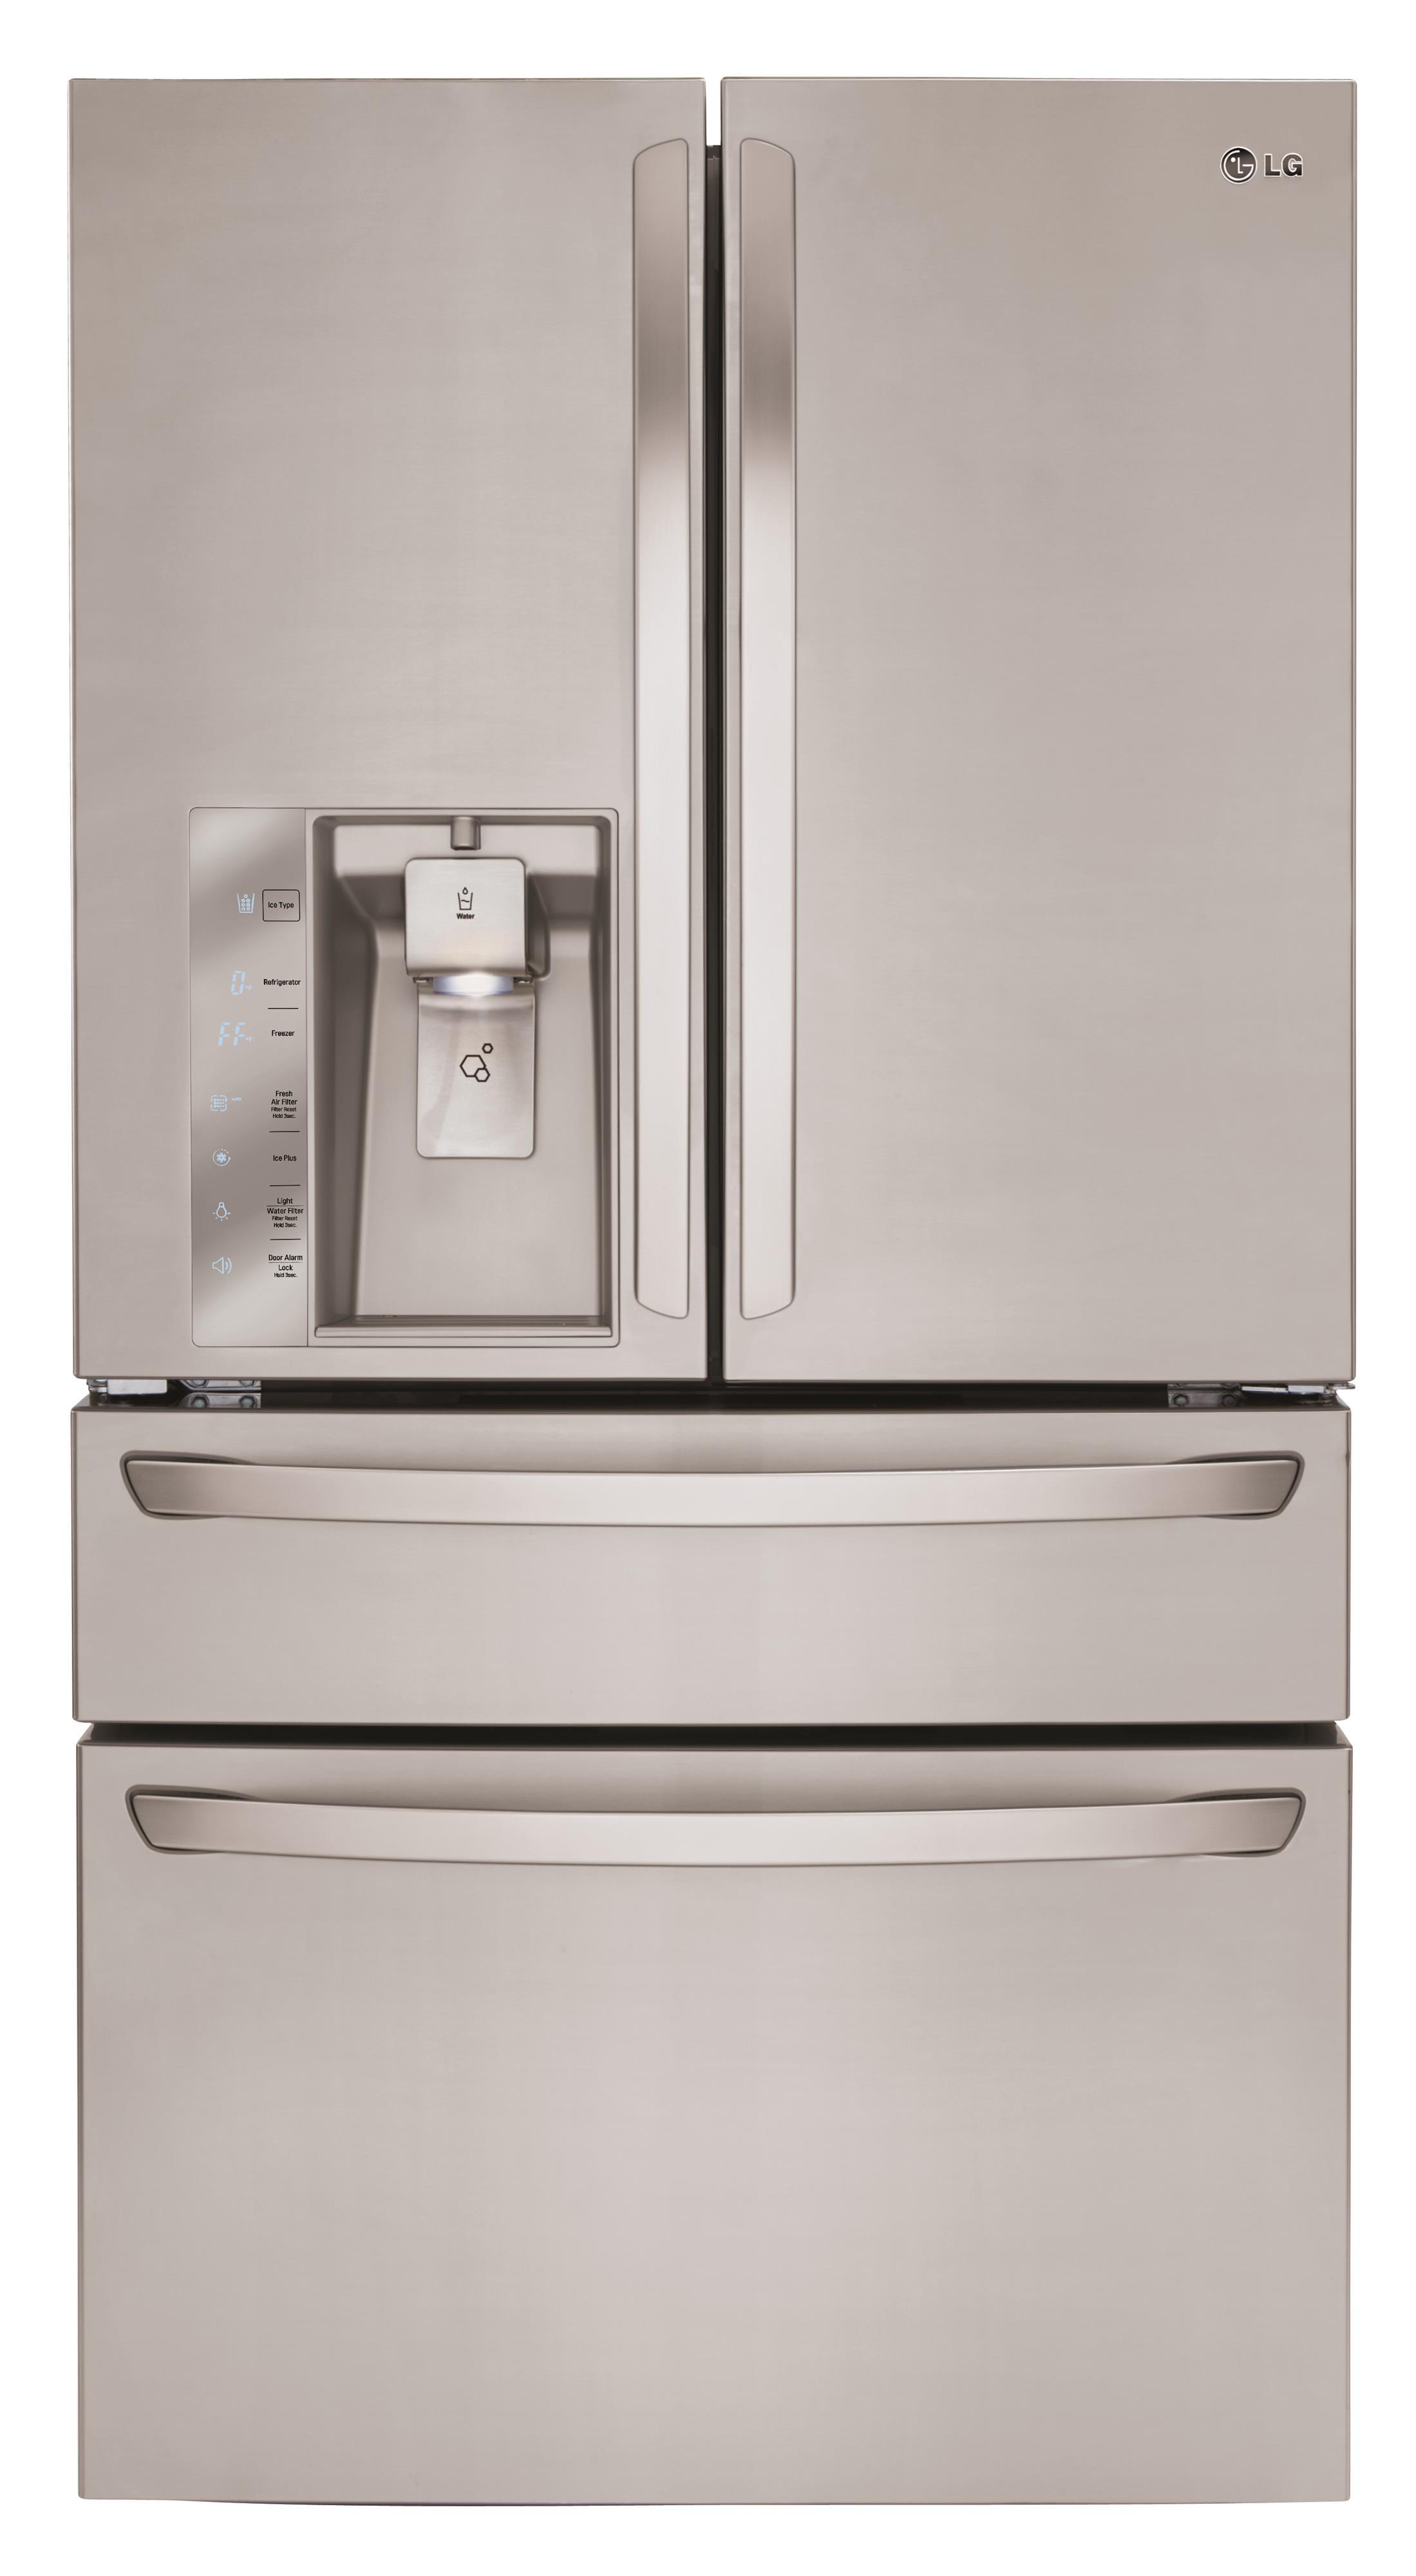 LG Appliances French Door Refrigerators 30 Cu. Ft. French Door Refrigerator - Item Number: LMXS30756S